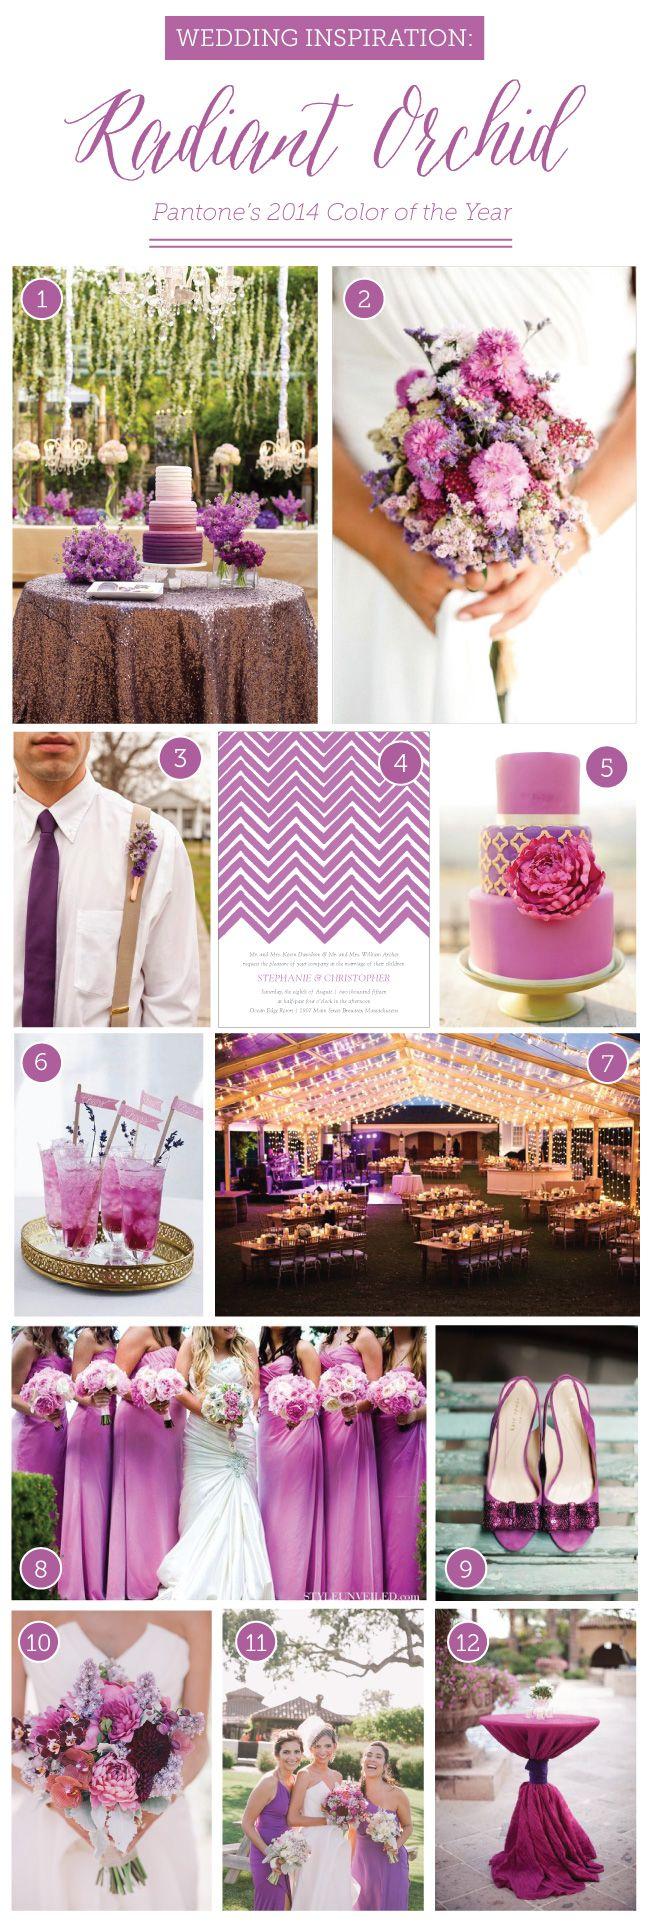 colores-de-boda-radiant-orchid-10